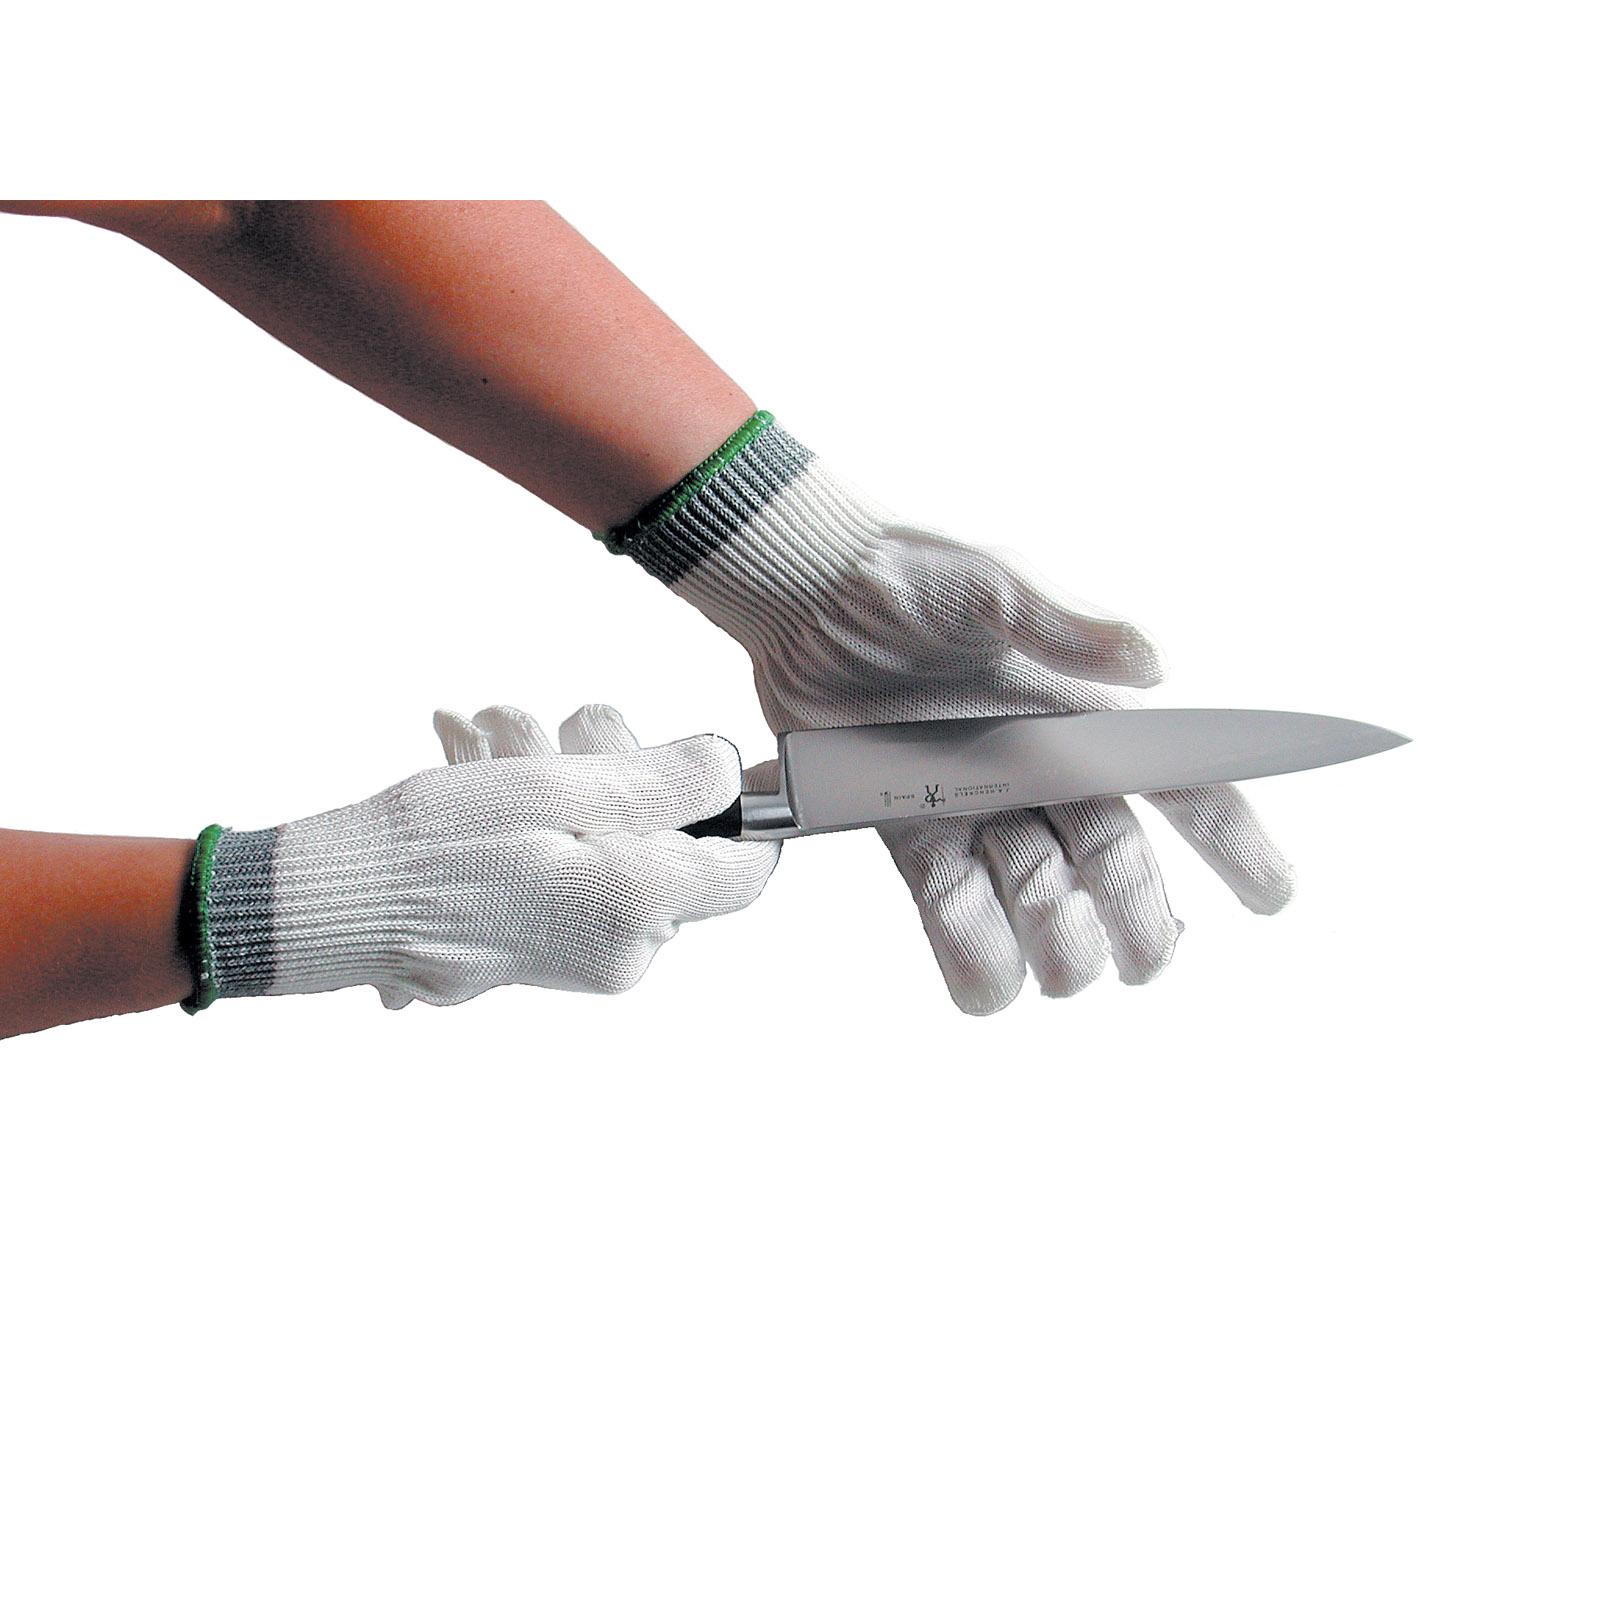 San Jamar SG10-M glove, cut resistant